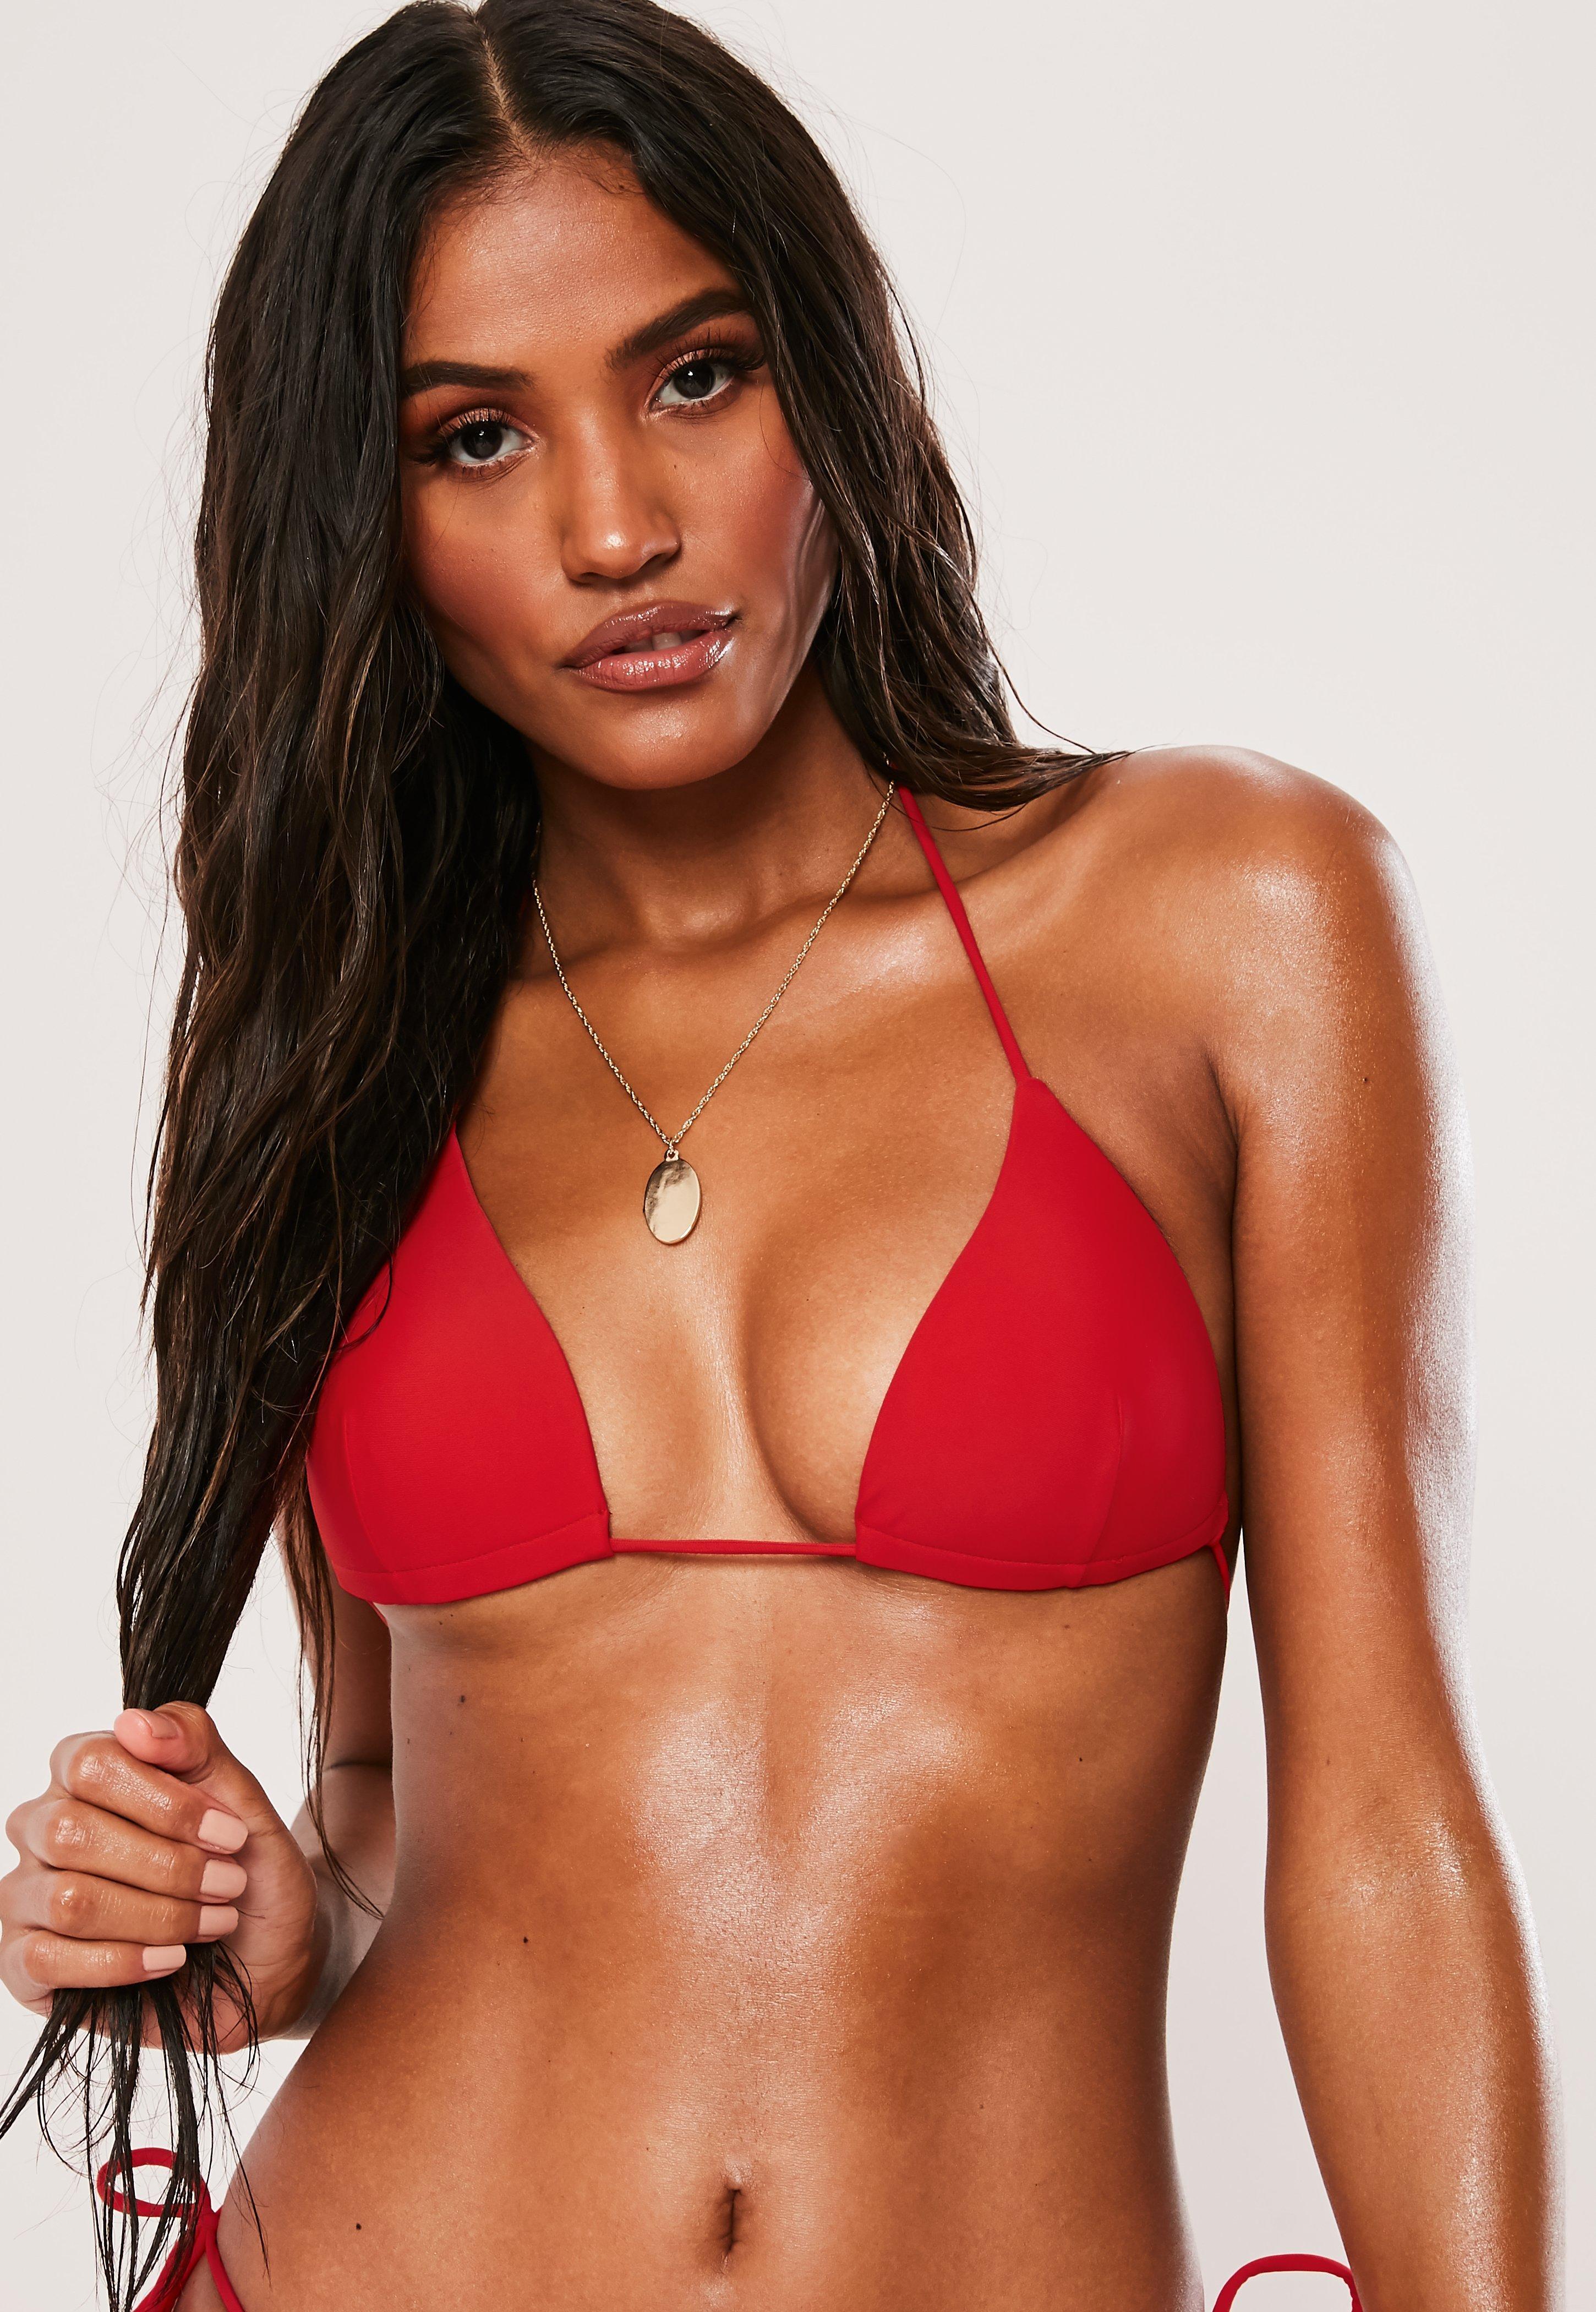 Bullet reccomend Red bikini pictures